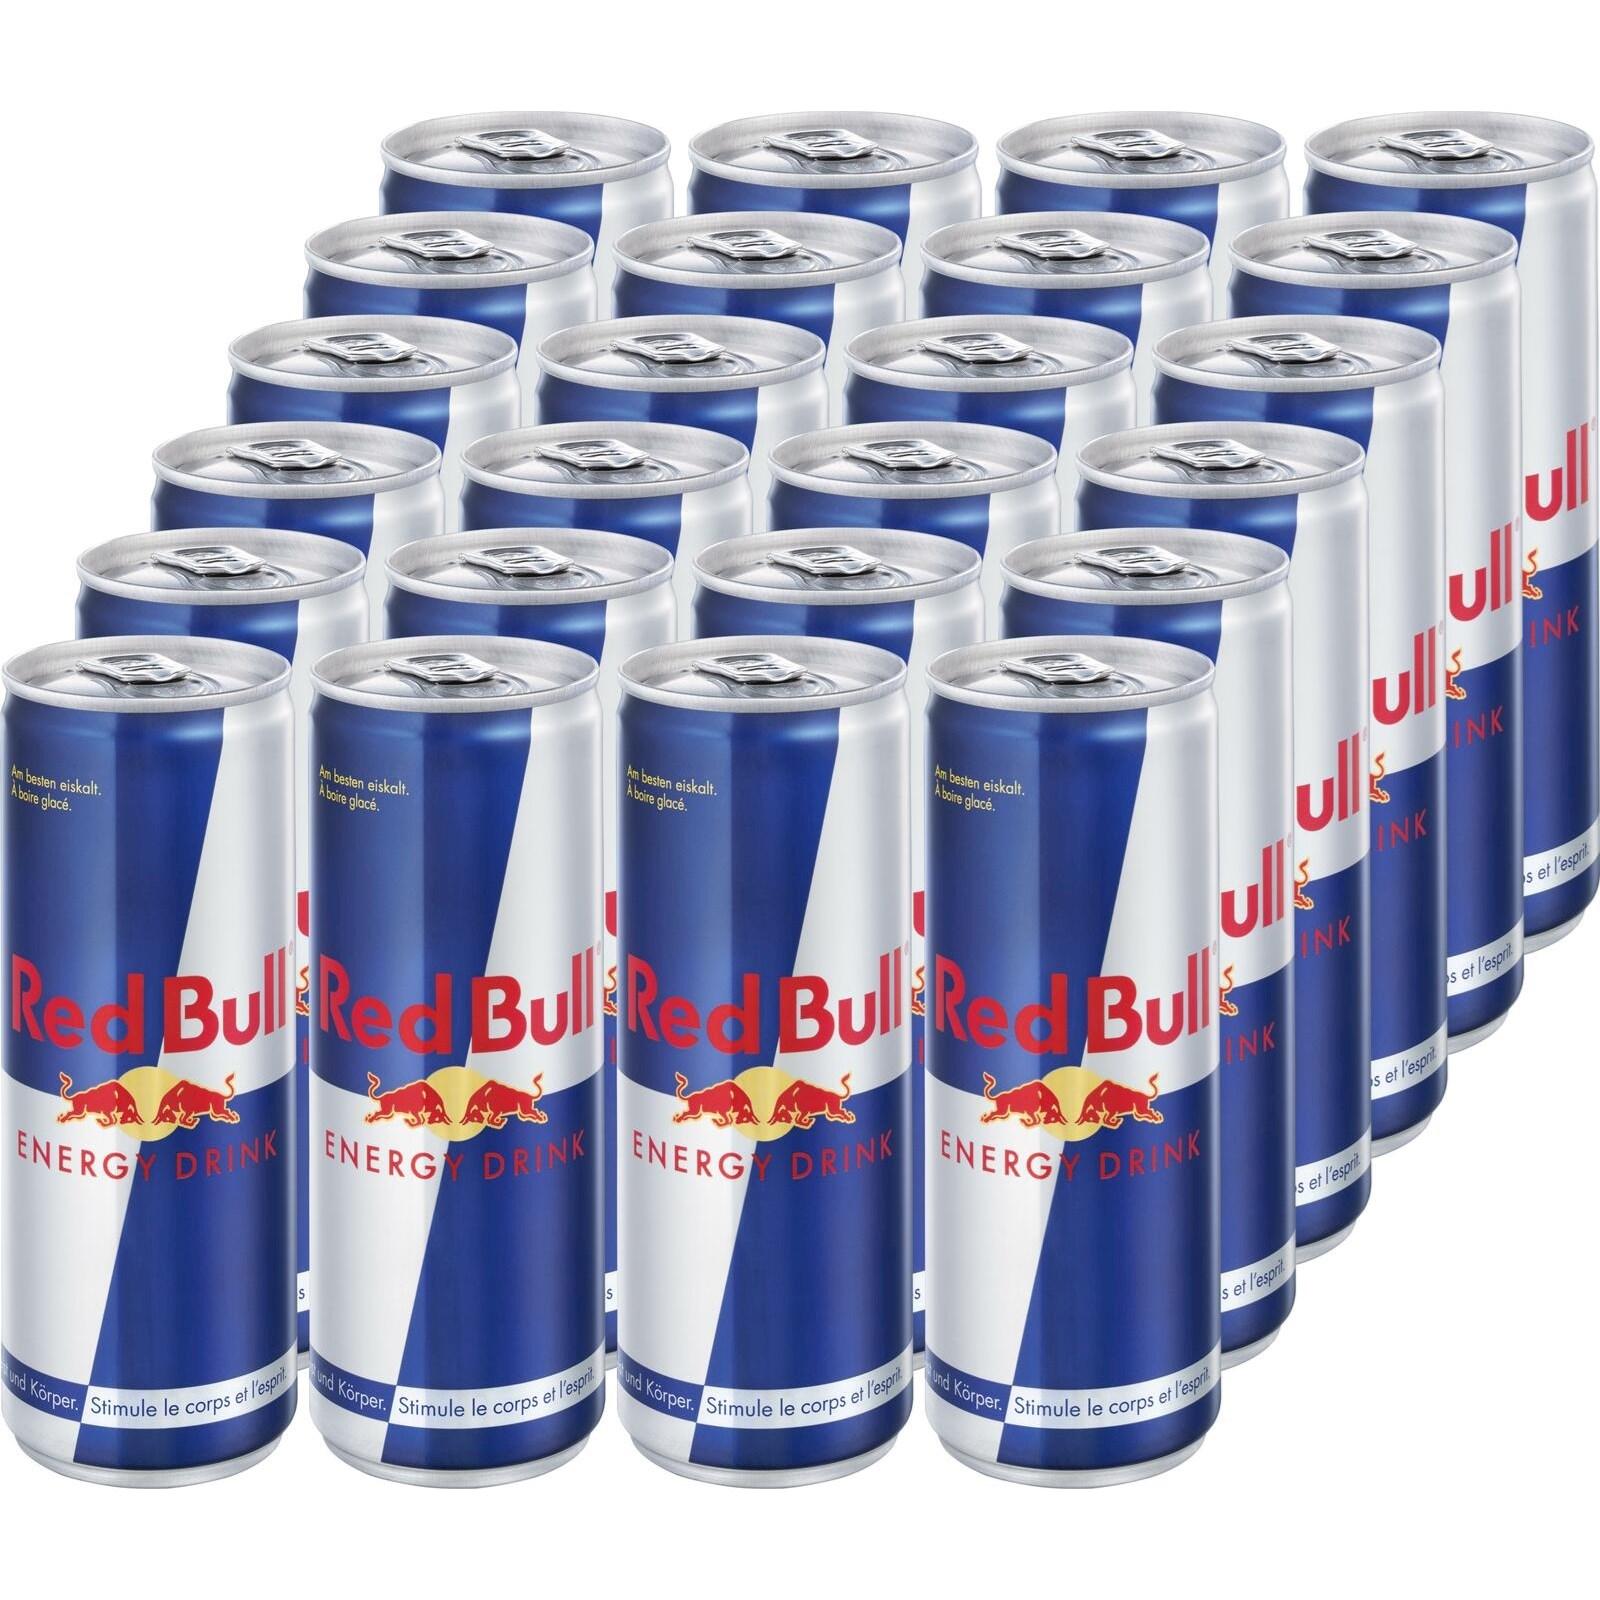 Energy Drink Red Bull Dose 24×25cl - Energy Drinks - LANDI